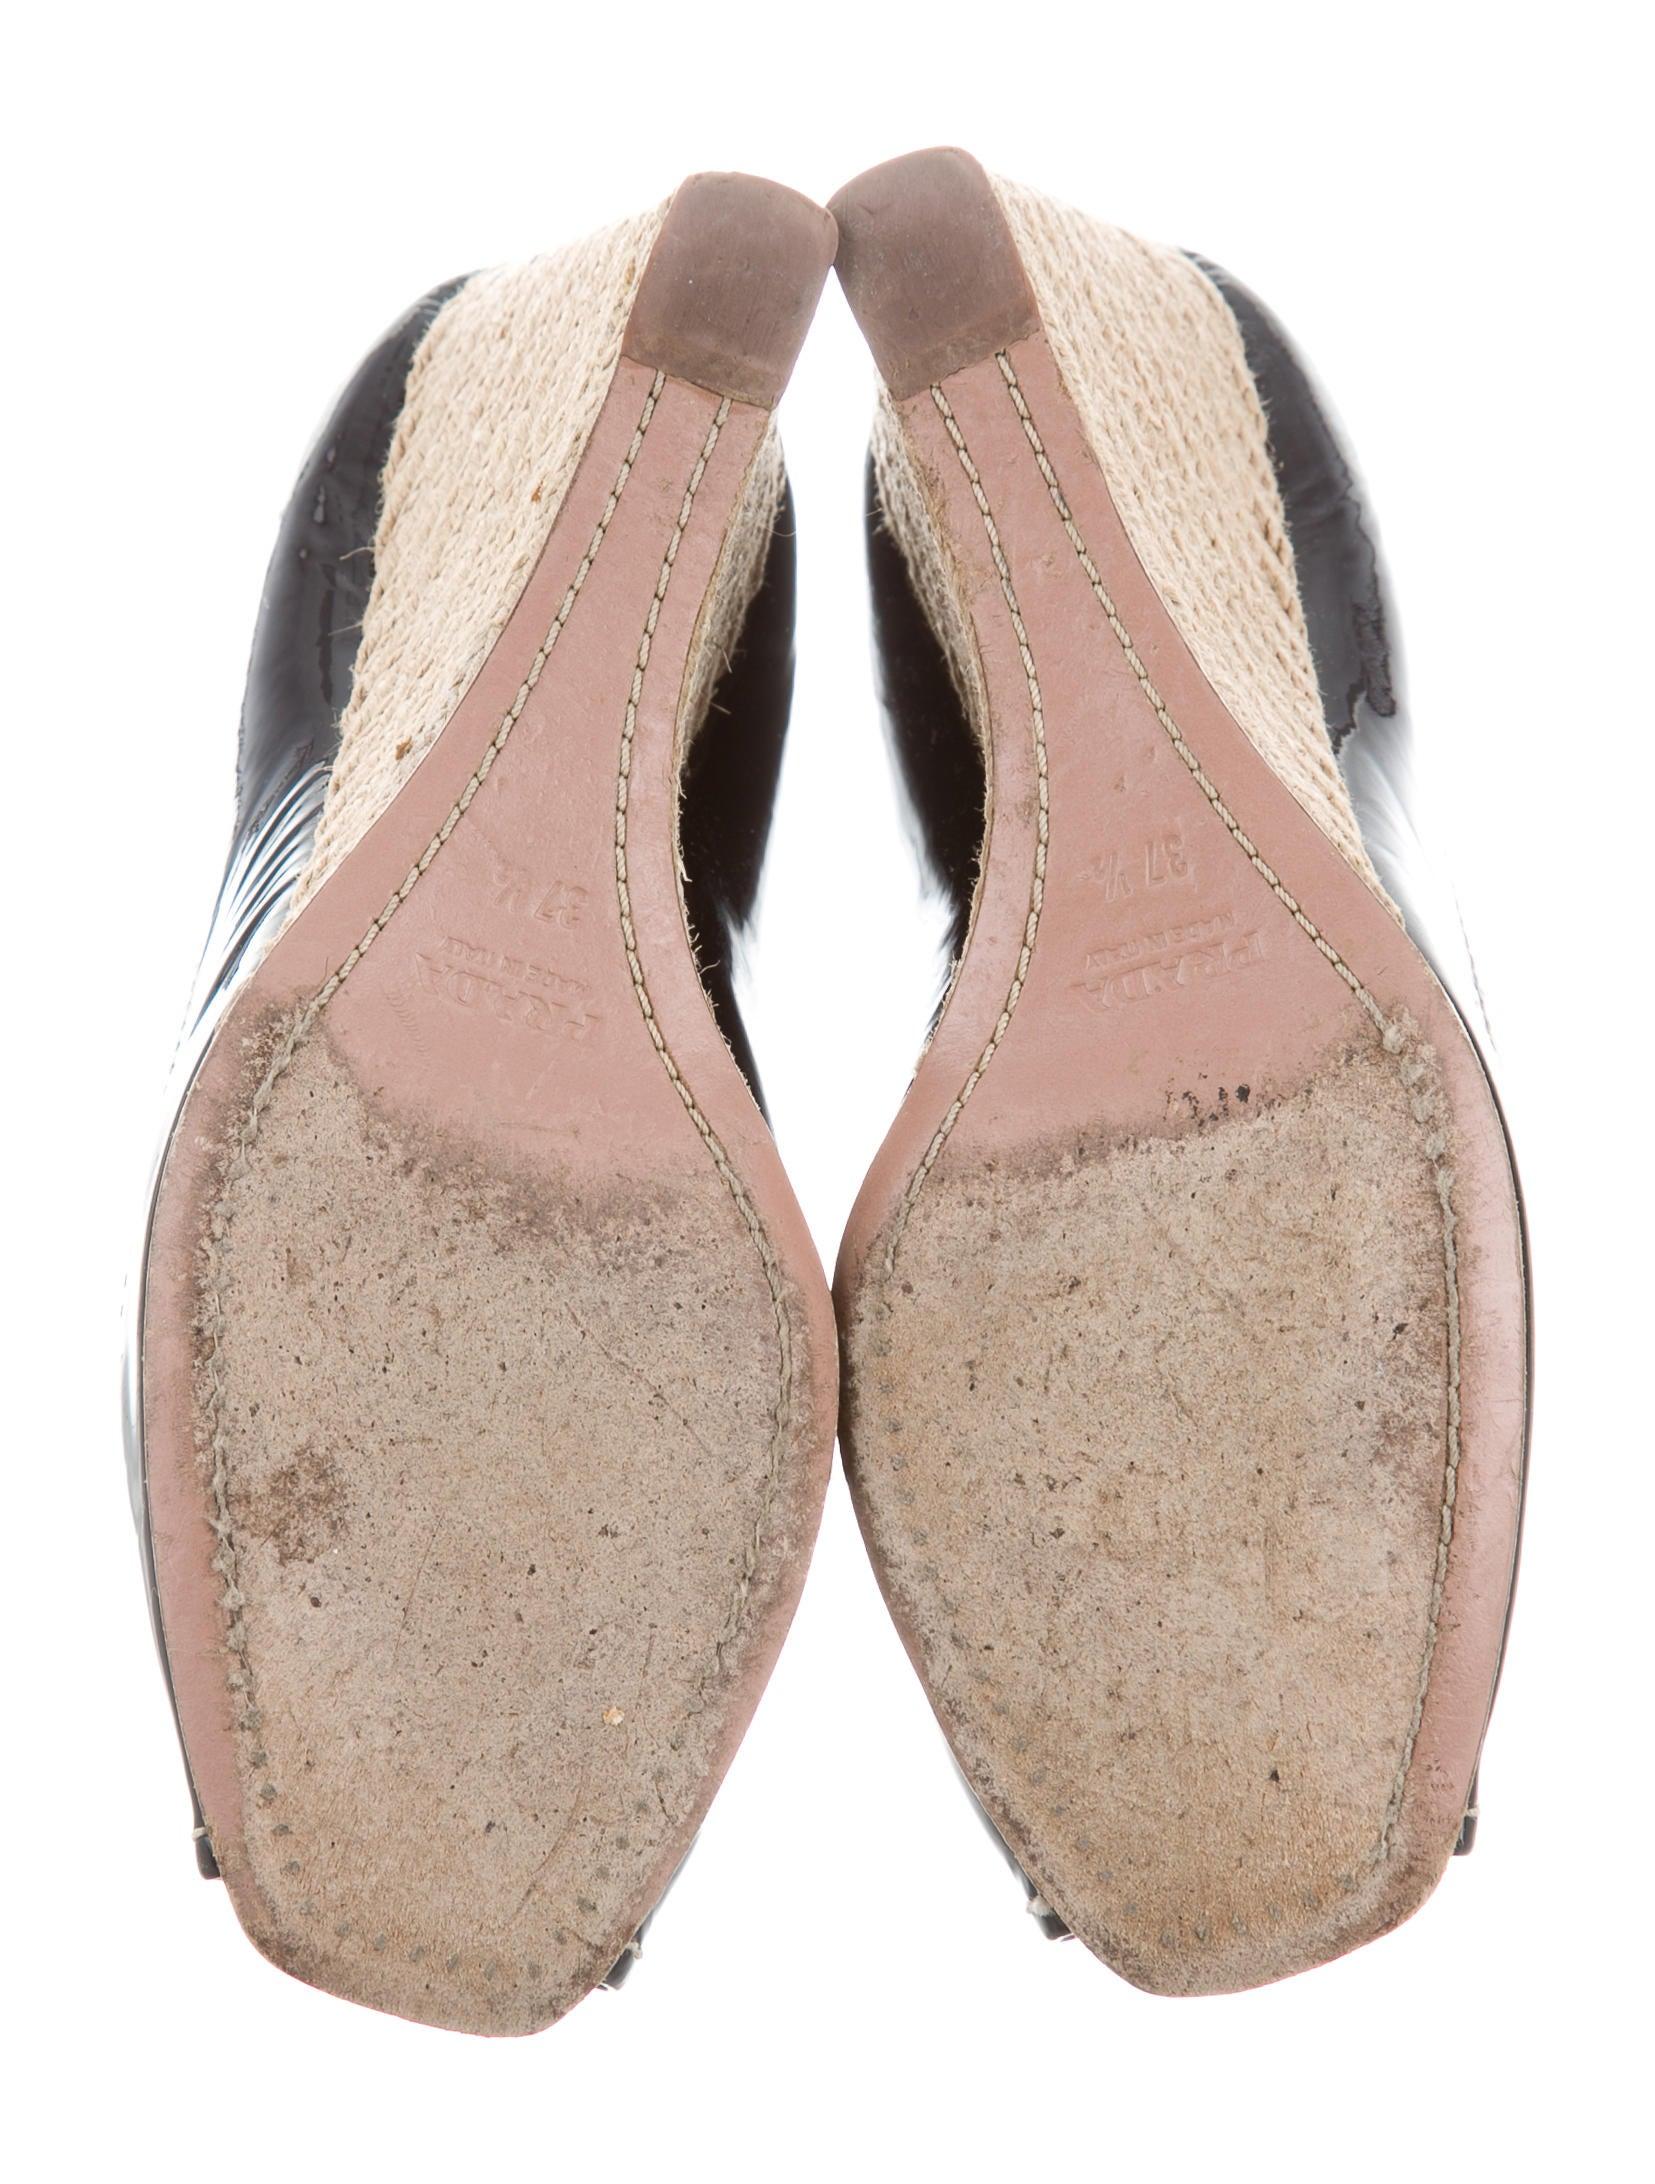 prada peep toe espadrille wedges shoes pra154880 the